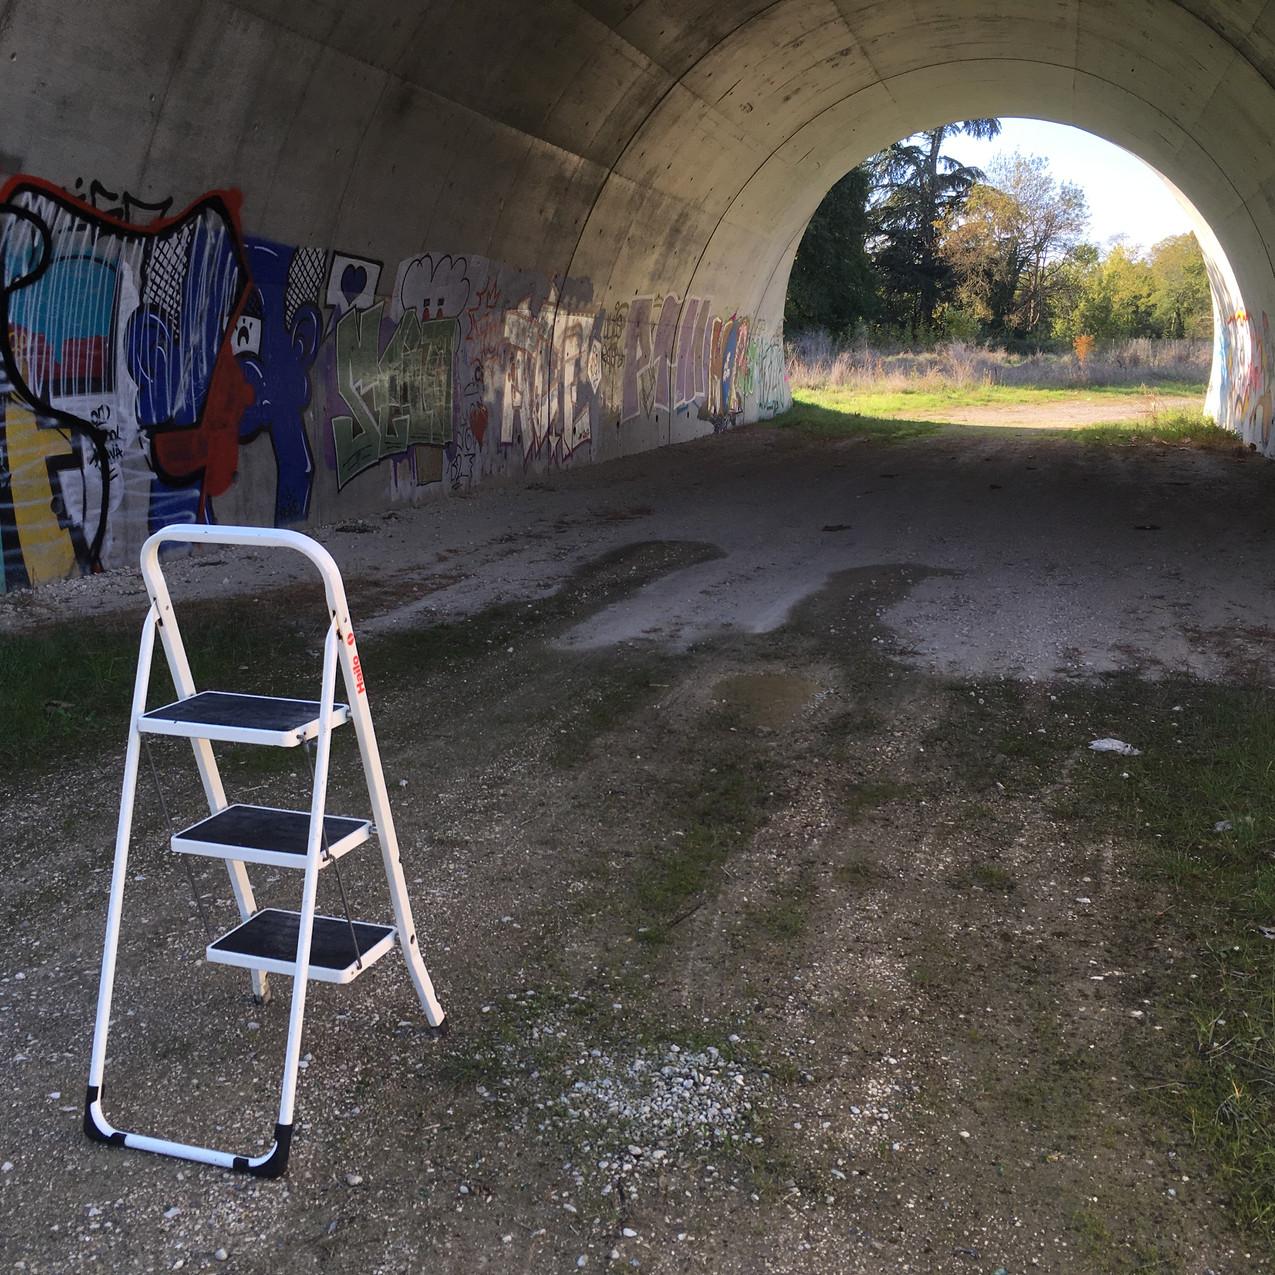 séance photo backstage, tunnel